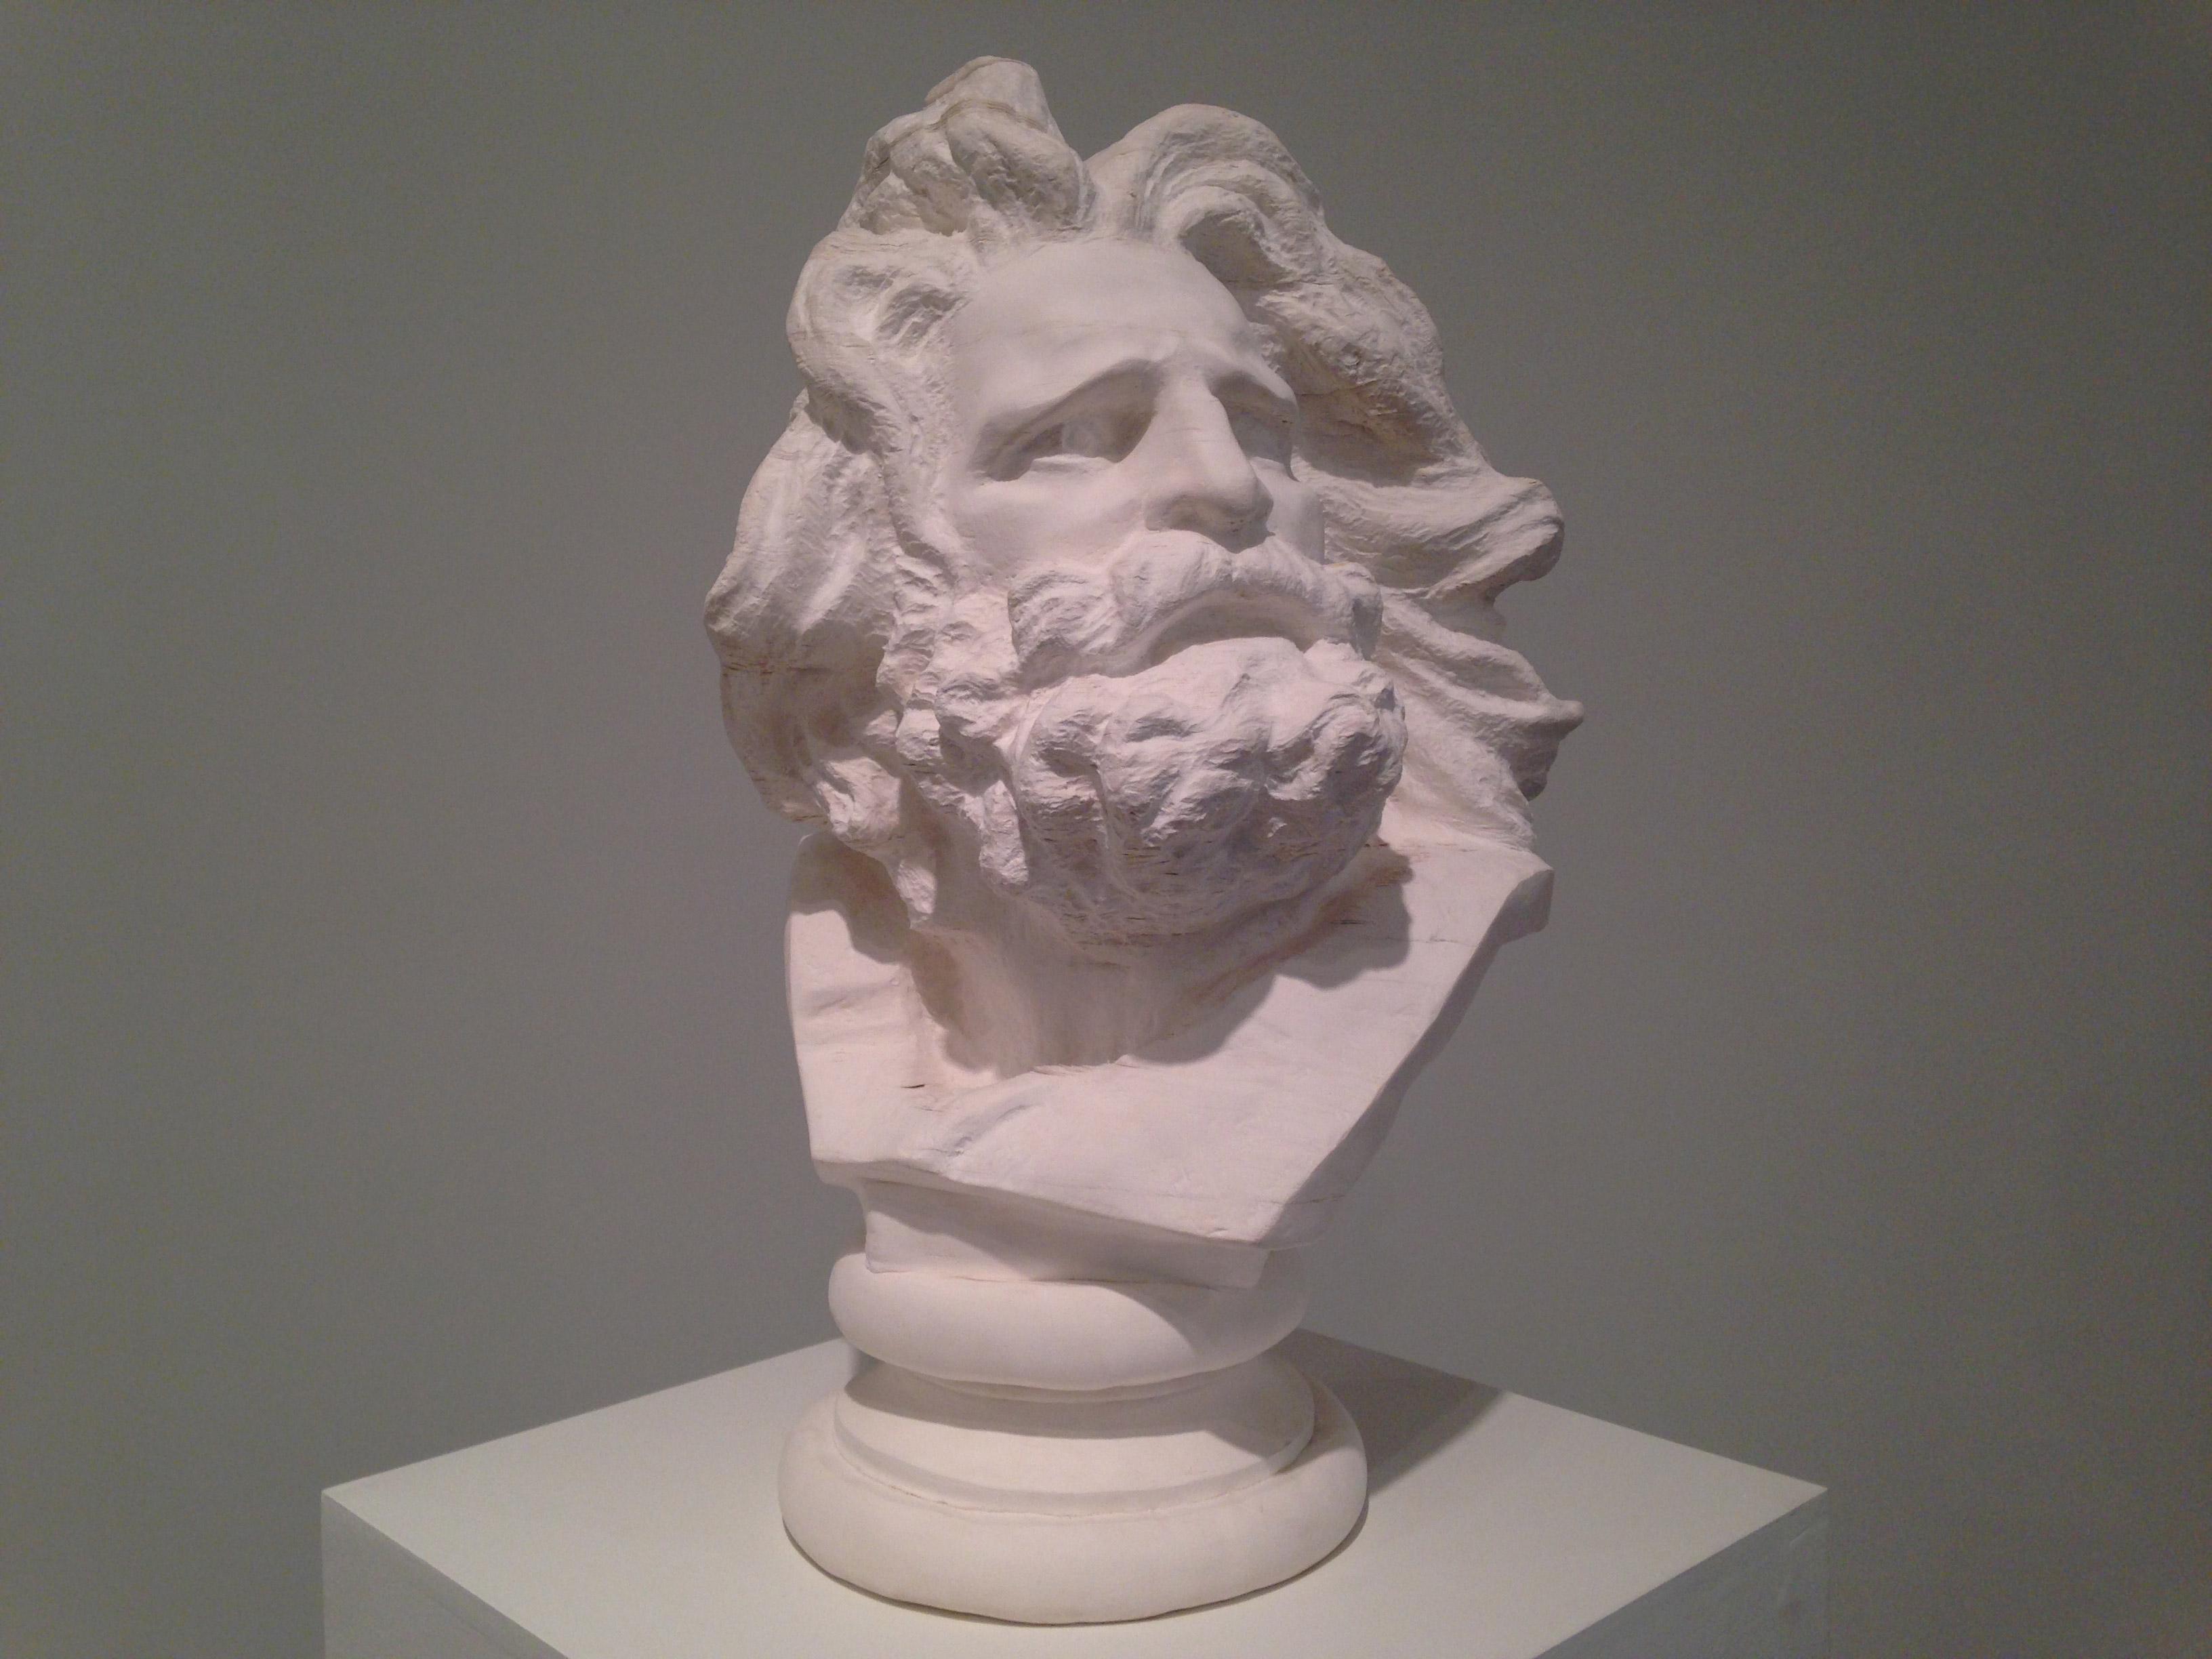 paper-sculptures-li-hongbo-17